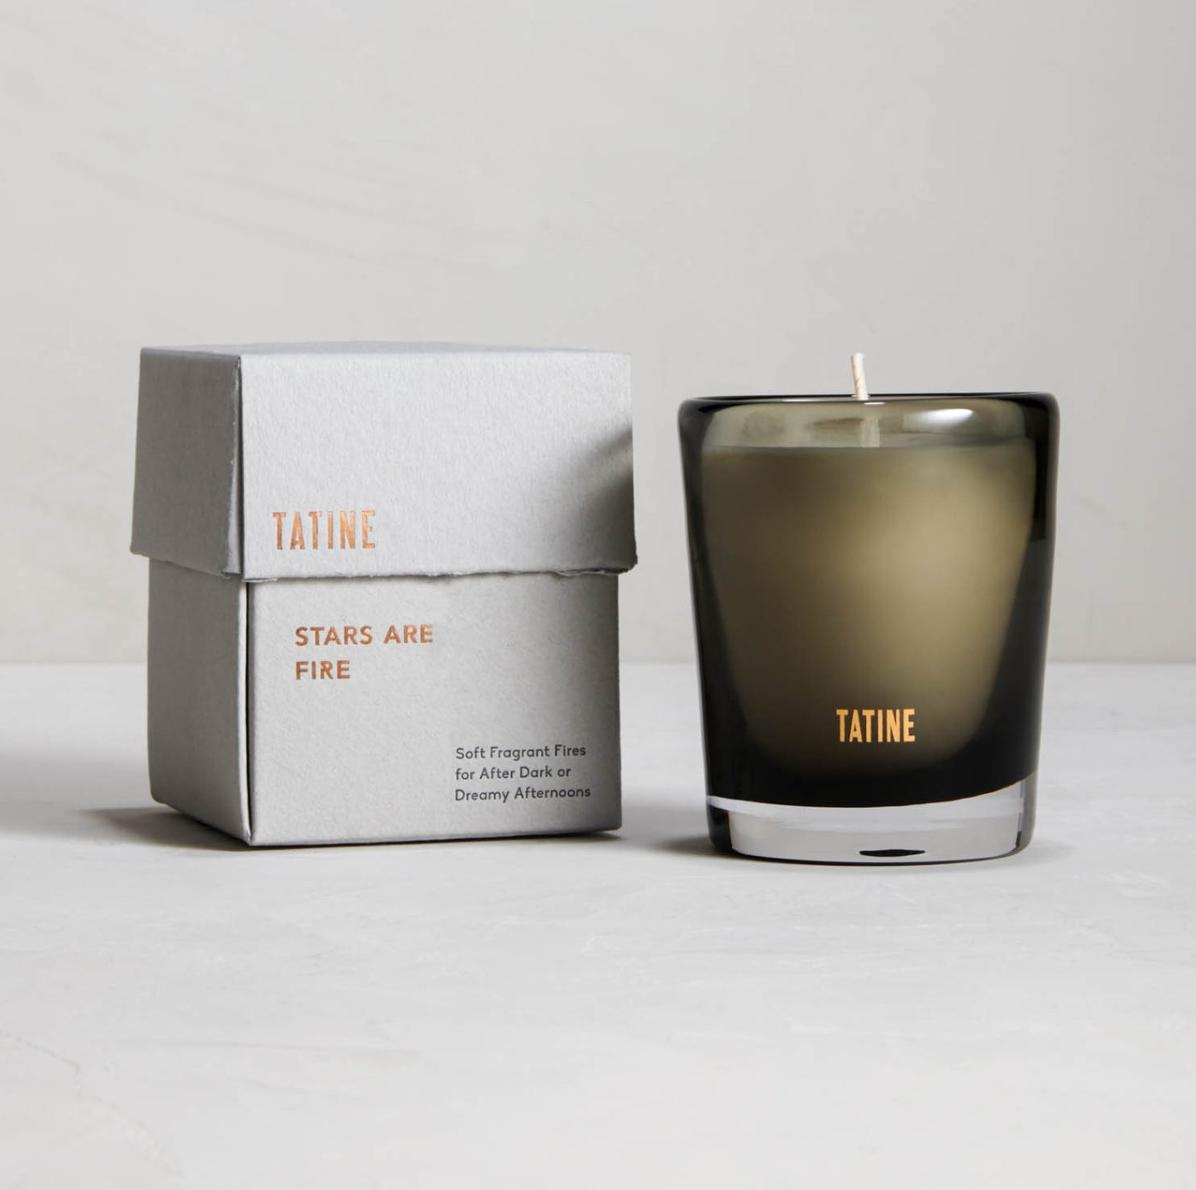 Tatine Fig Candle